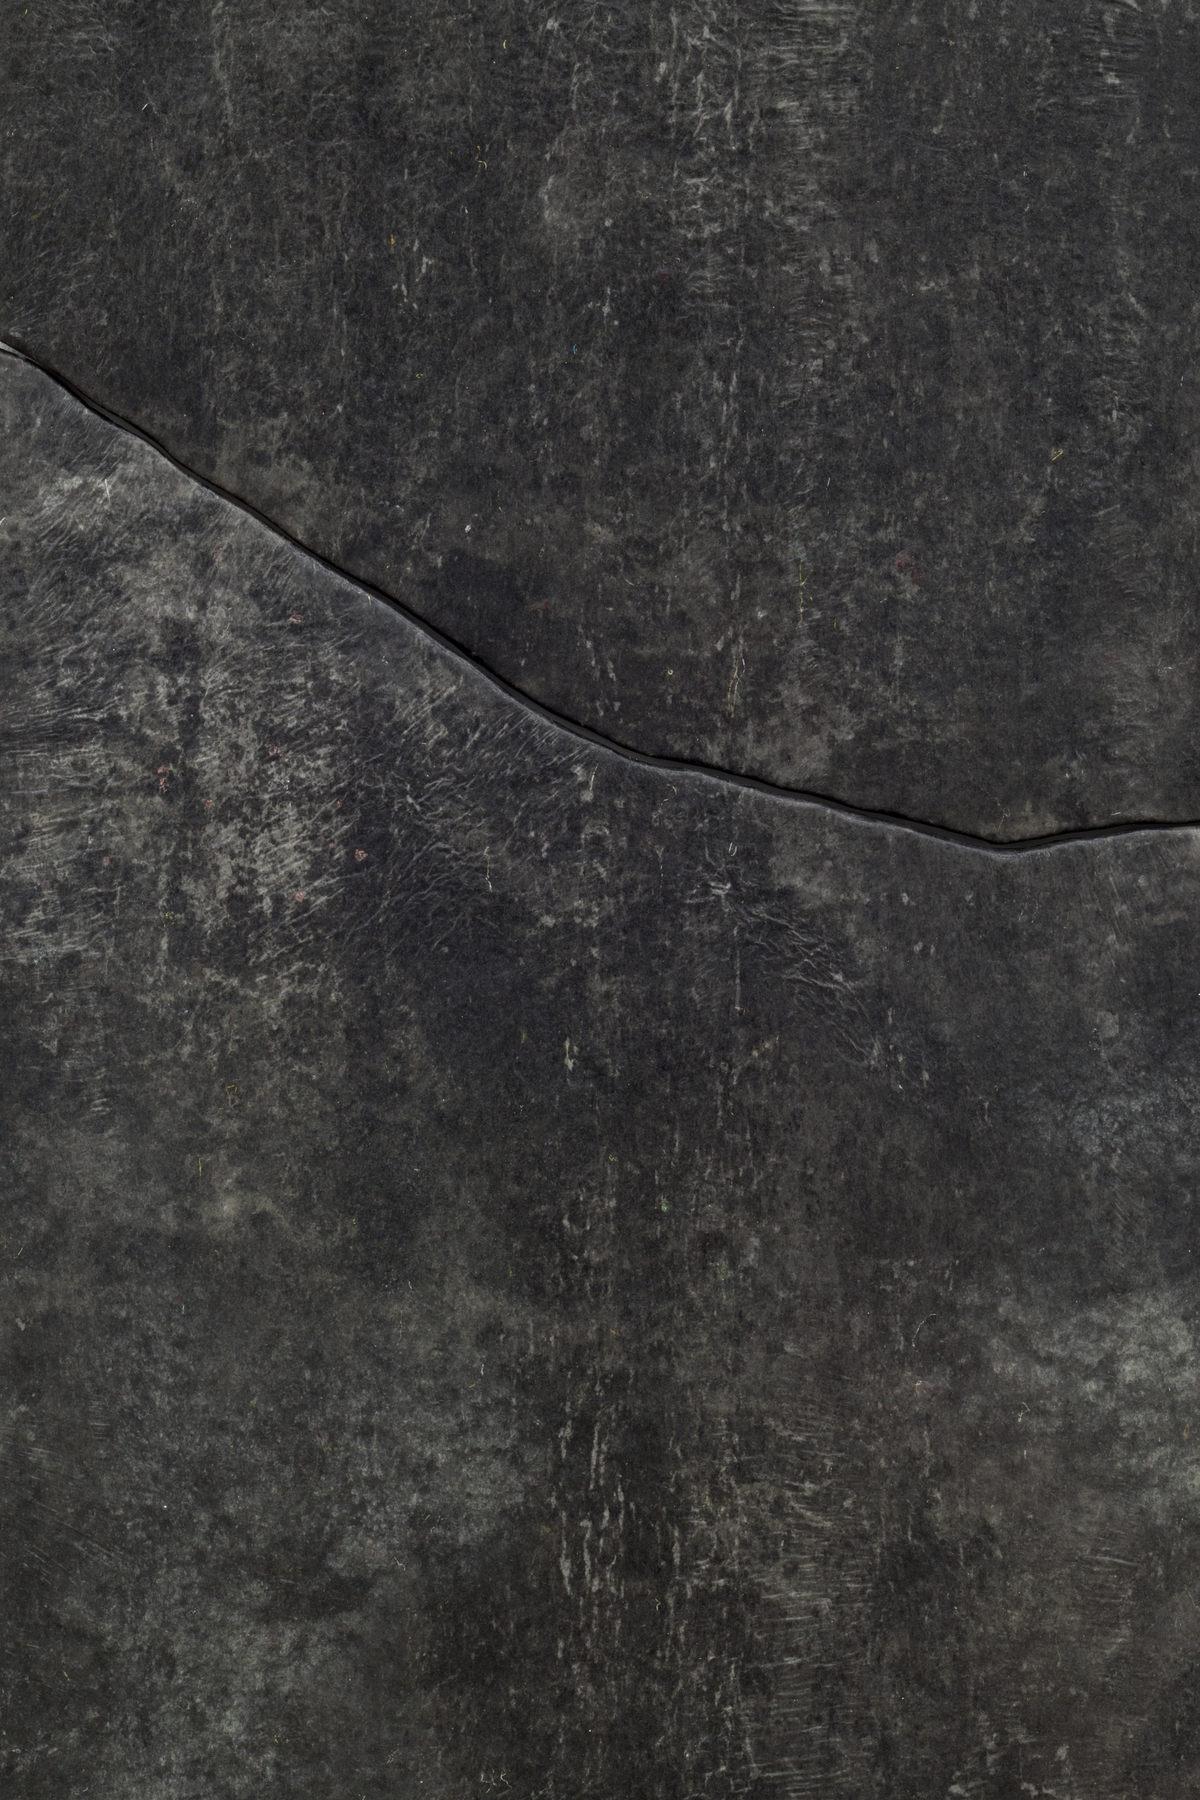 004_Mikkel Carl_Untitled_detail